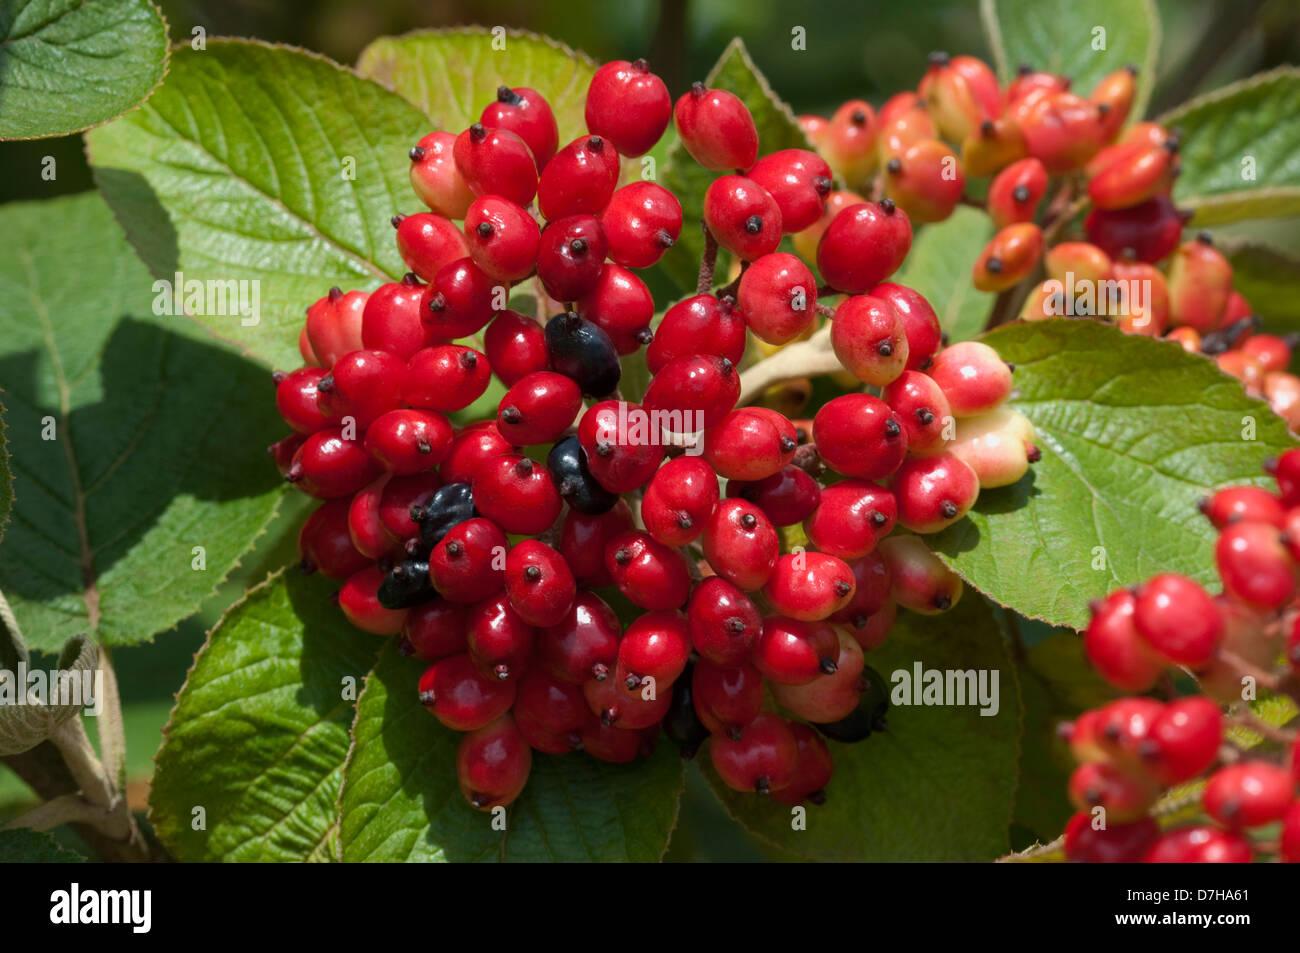 Wayfaring Tree, Hoarwithy, Twistwood, Meal Tree (Viburnum lantana), unripe berries on a twig Stock Photo